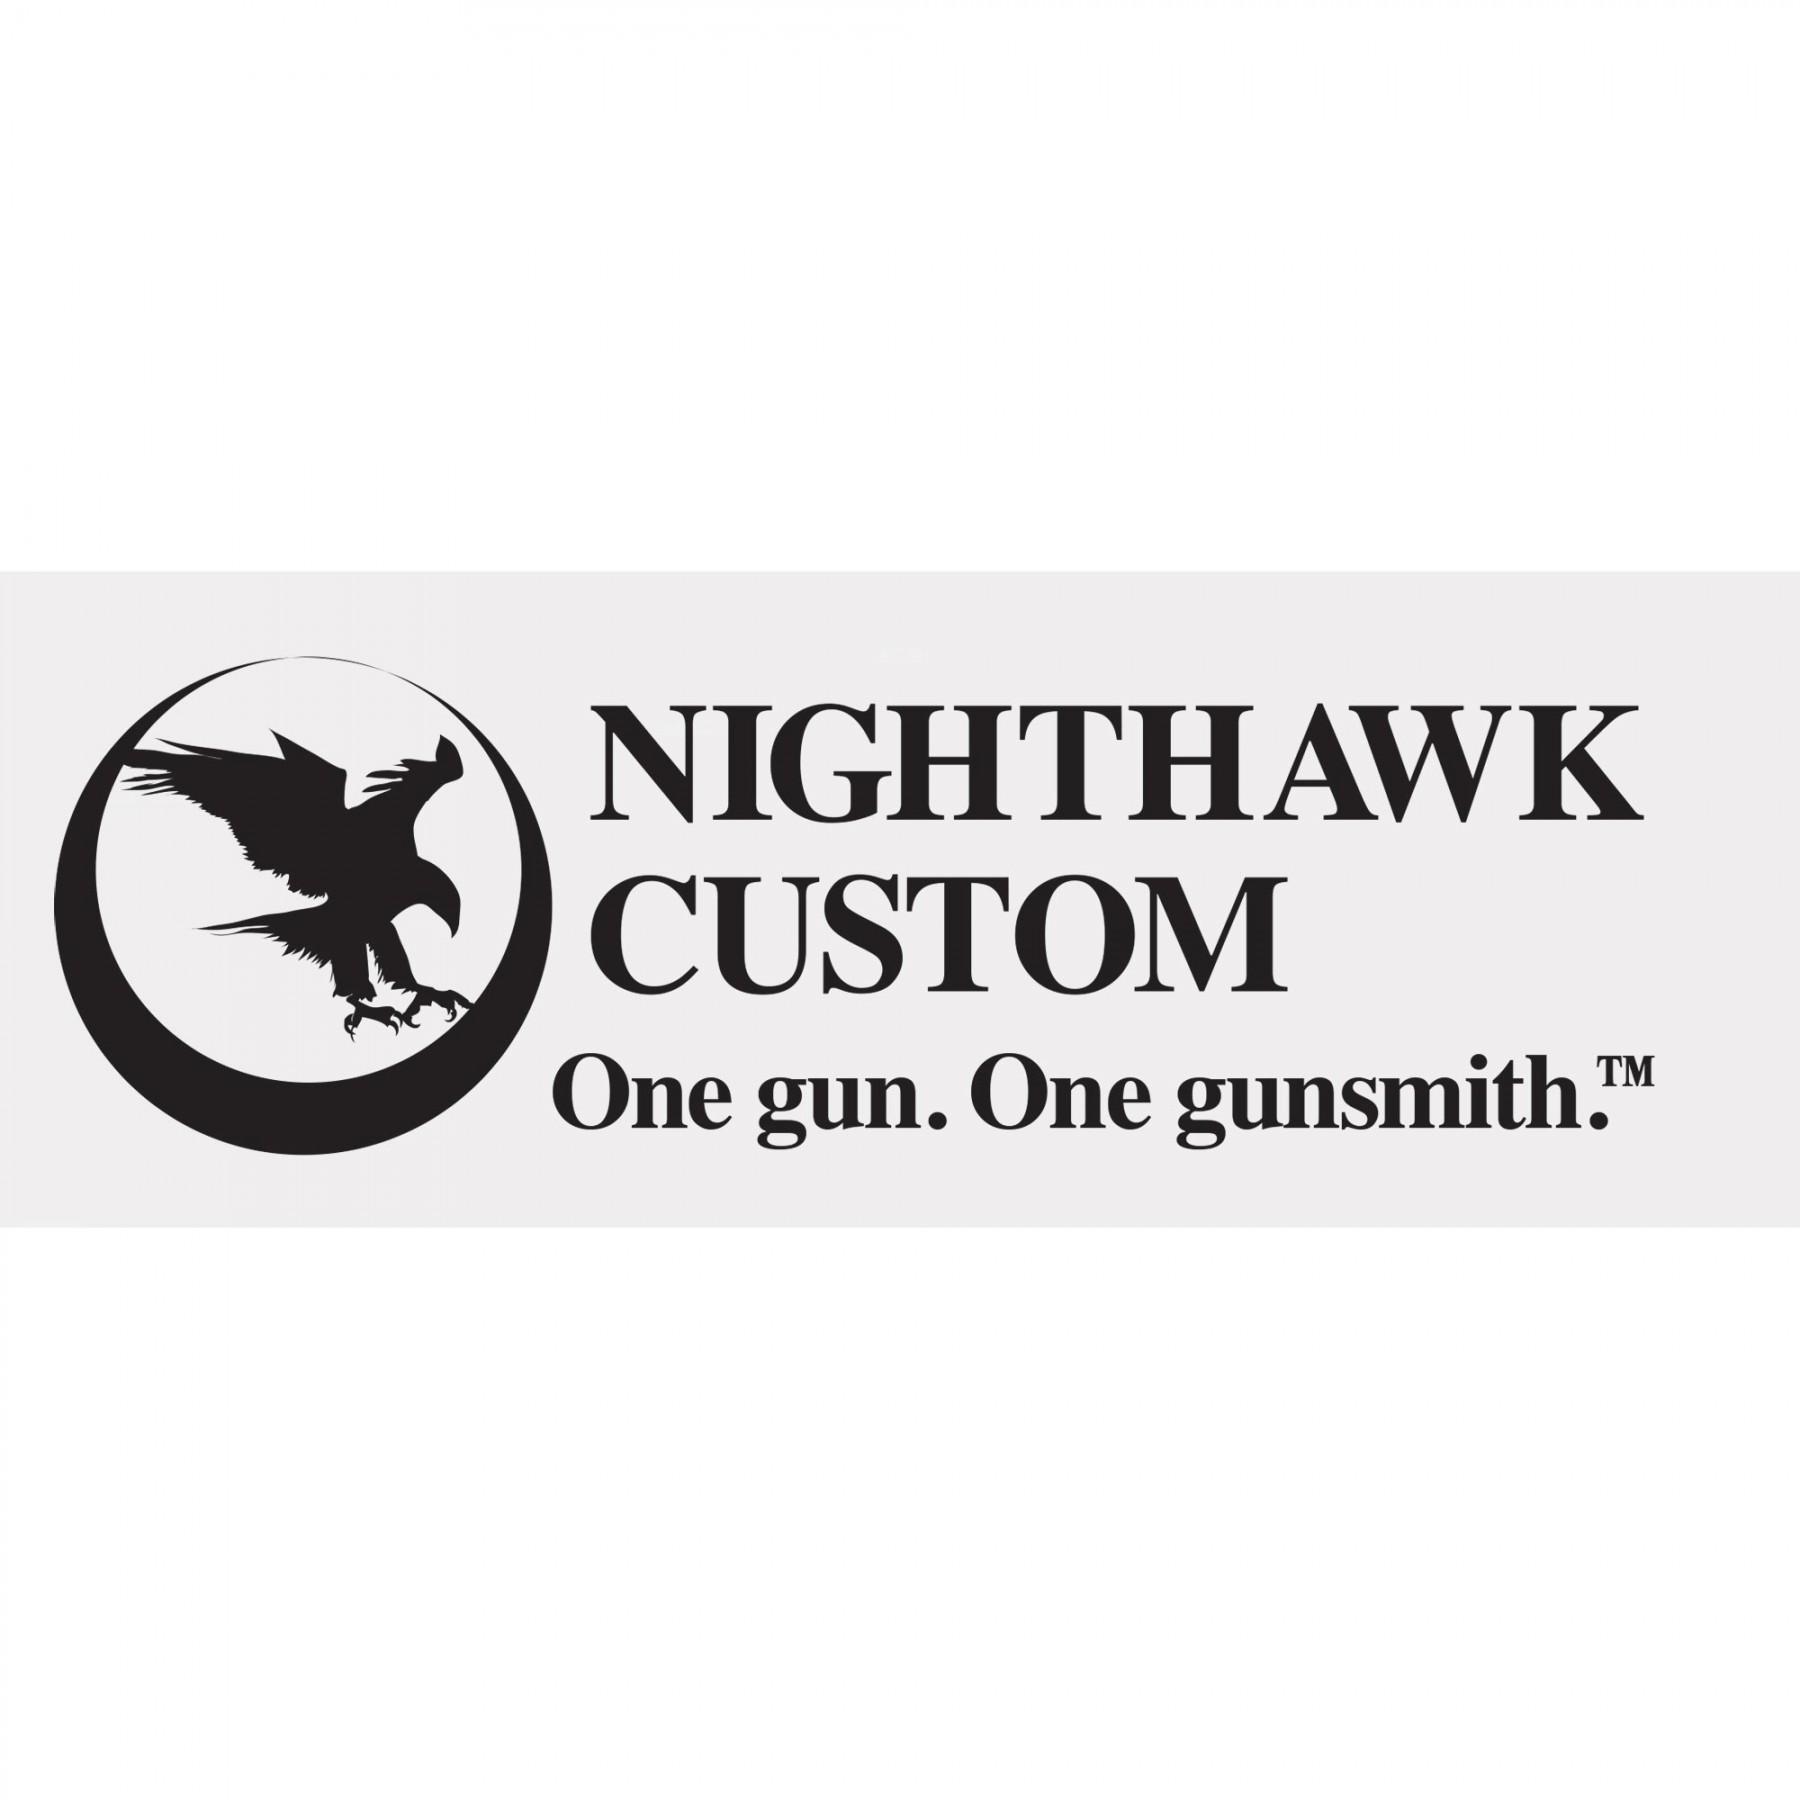 Nighthawk Customs